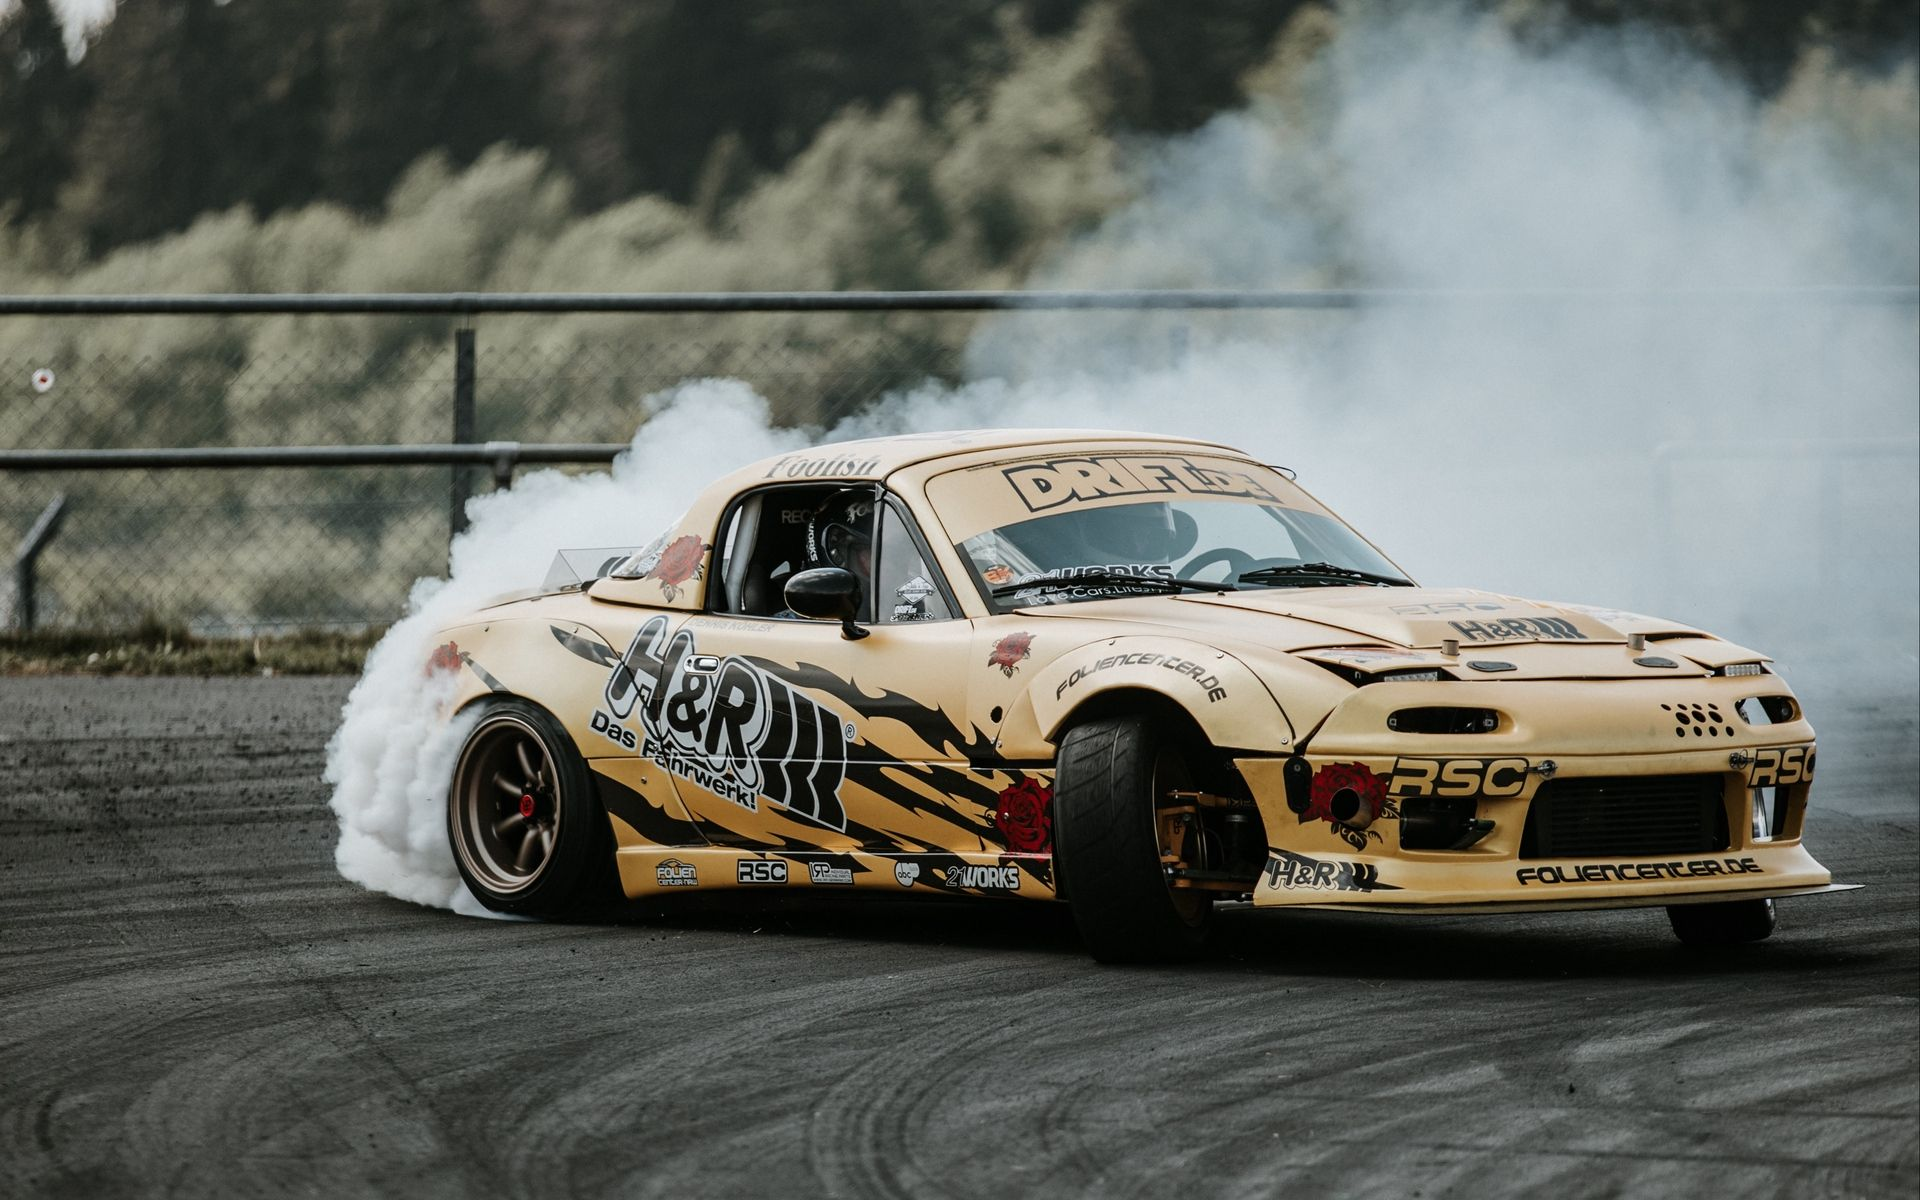 Best Drifting Wallpaper Hd Sports Car Sports Car Wallpaper Car